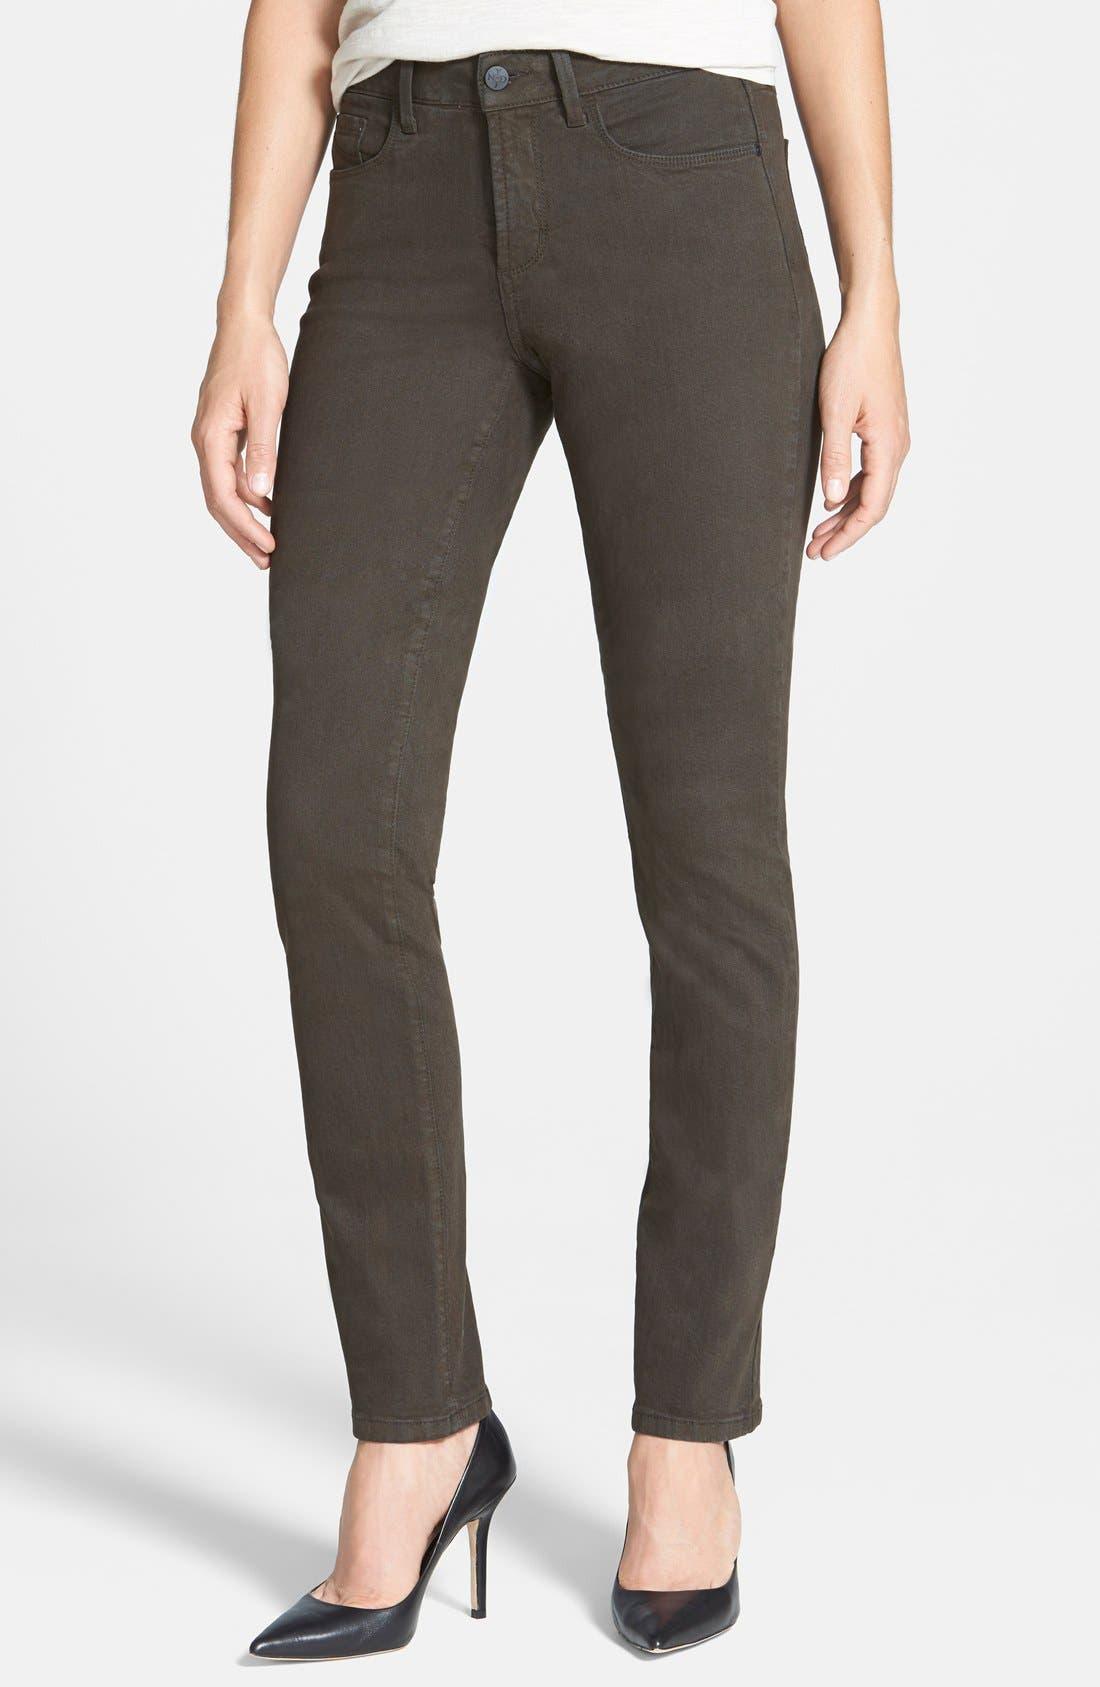 Main Image - NYDJ Sheri Colored Stretch Skinny Jeans (Petite)